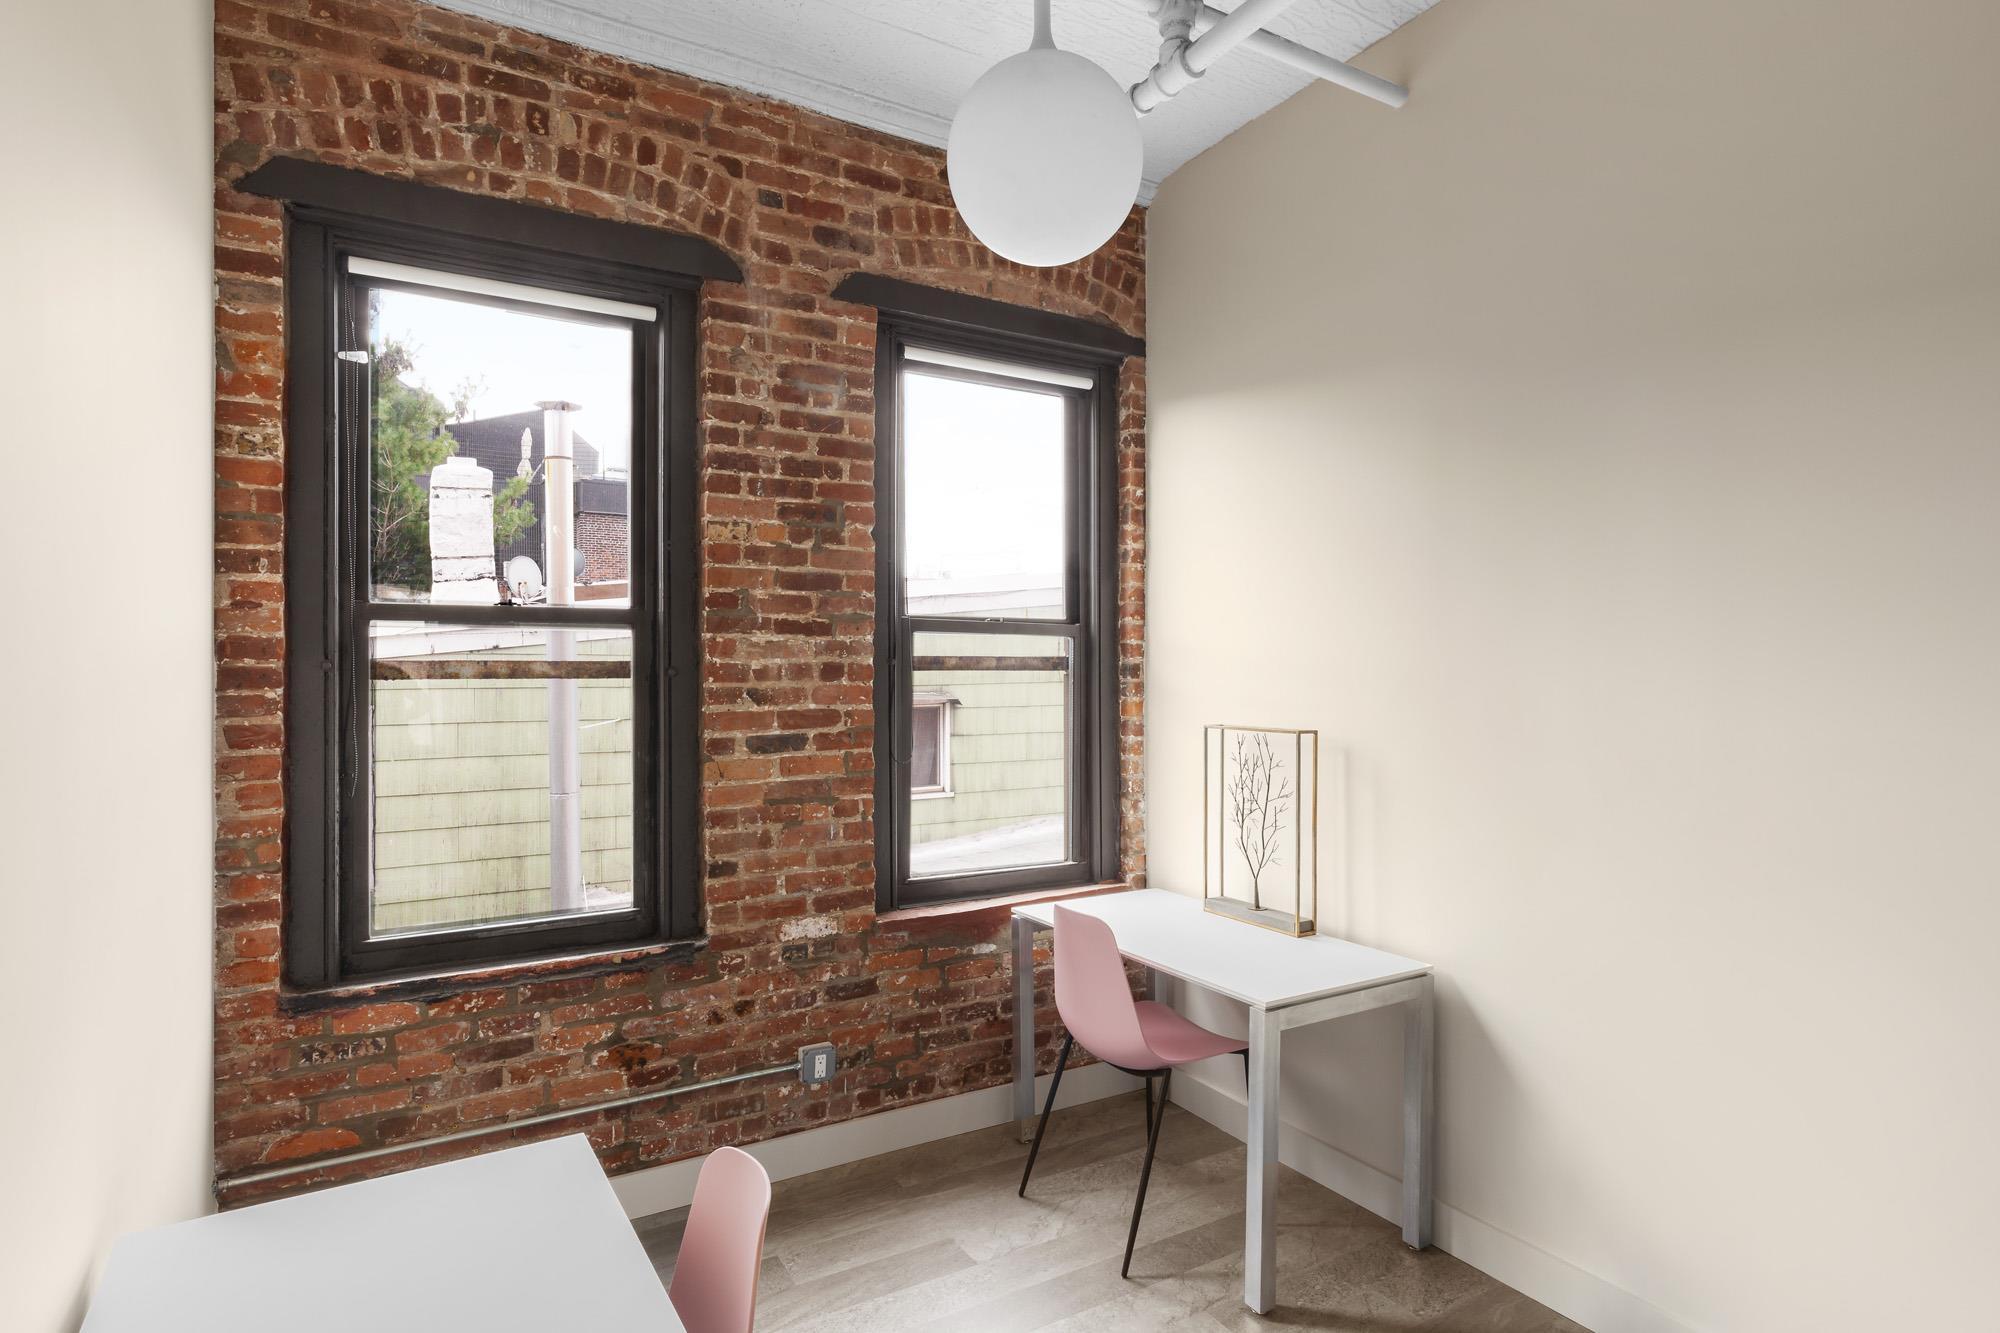 CLASS&CO - Office Space - 3 desks